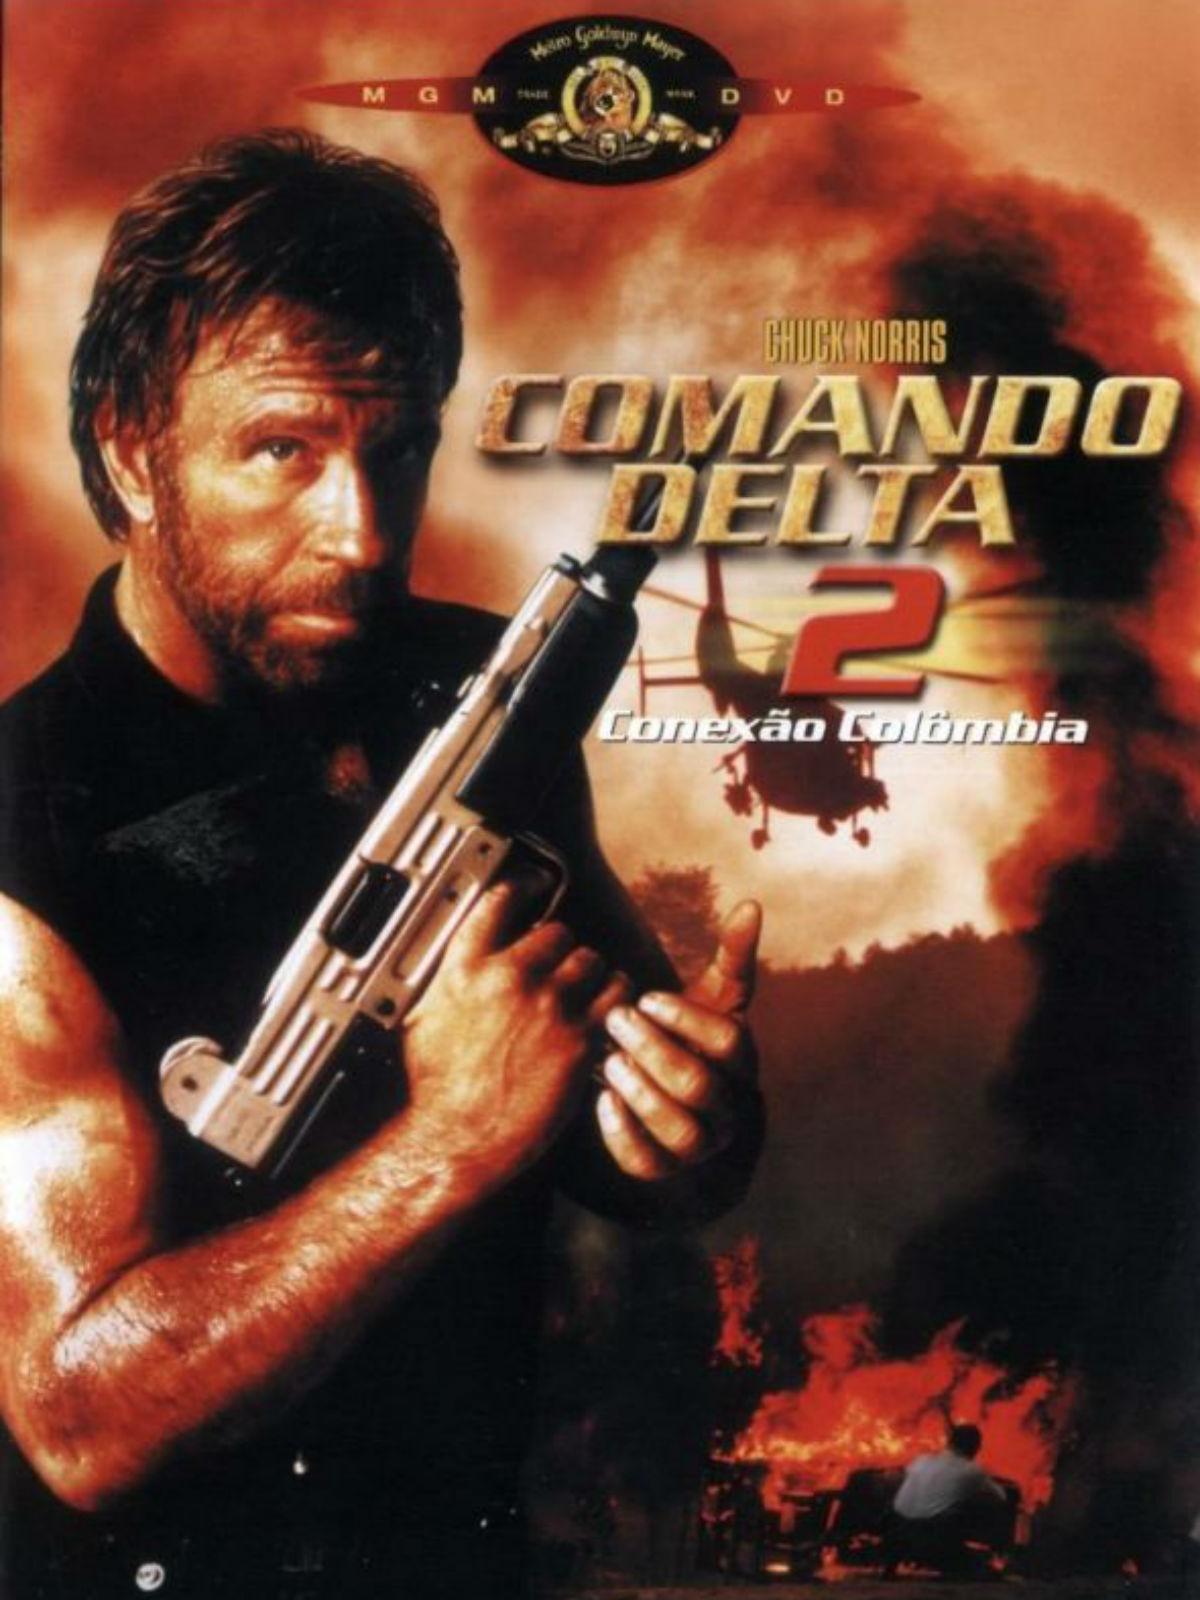 Comando Delta 2 – Conexão Colômbia - Filme 1990 - AdoroCinema